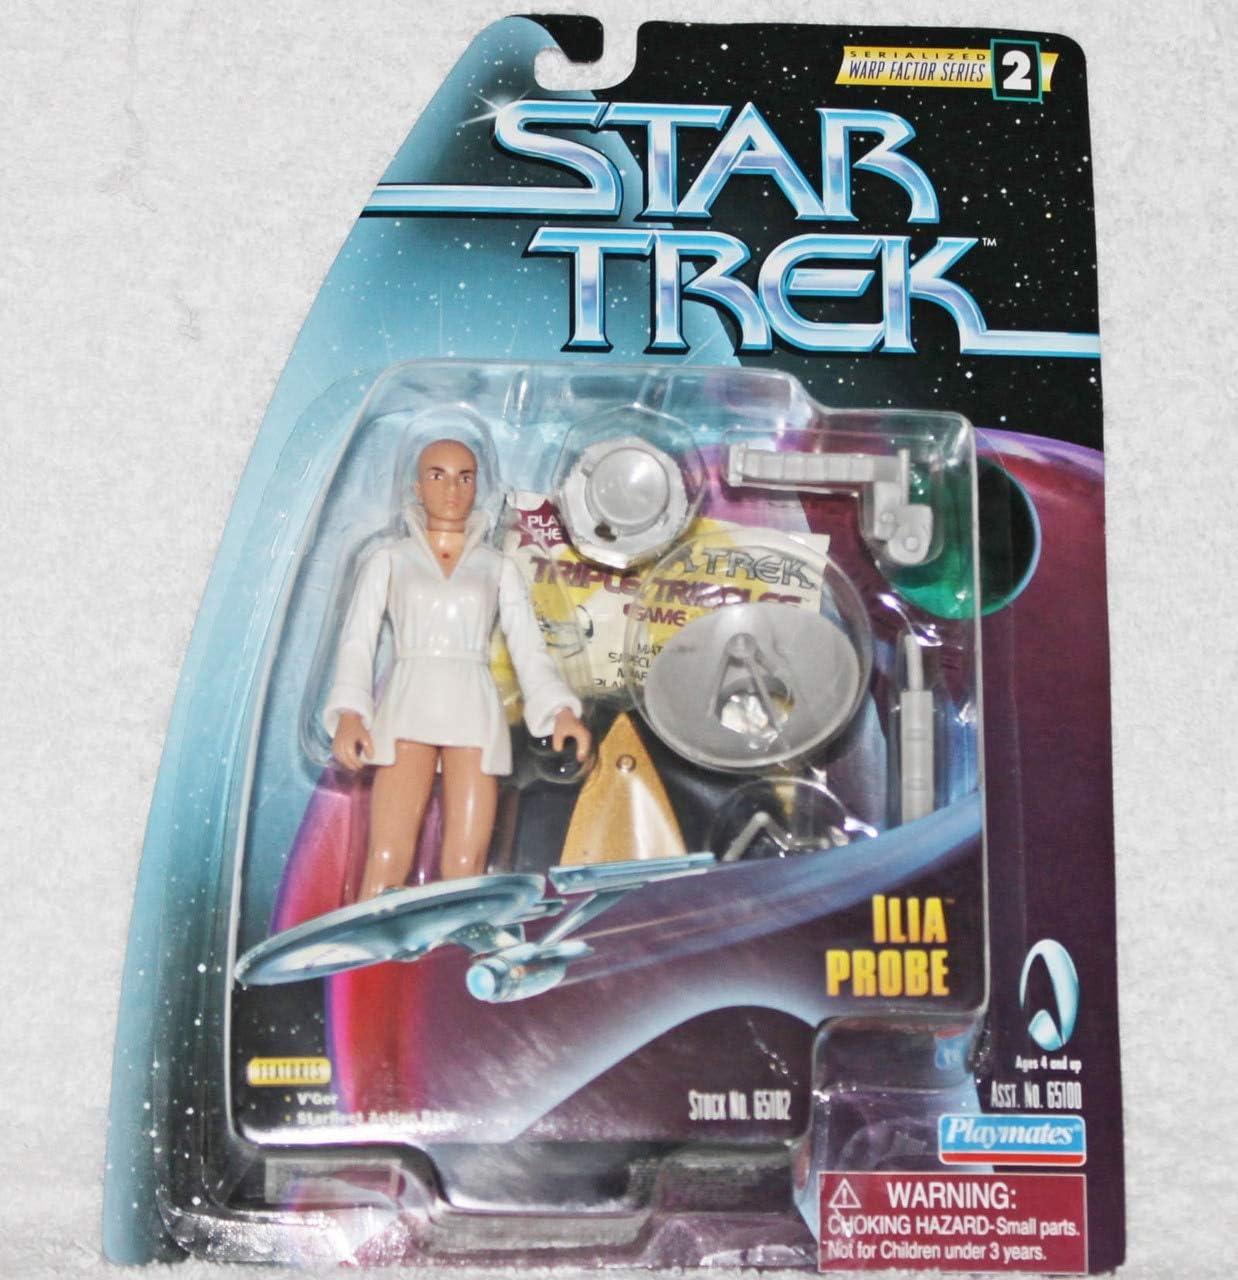 Star Trek The Motion Picture: Warp Factor Series 2 Ilia Probe 4 inch Action Figure